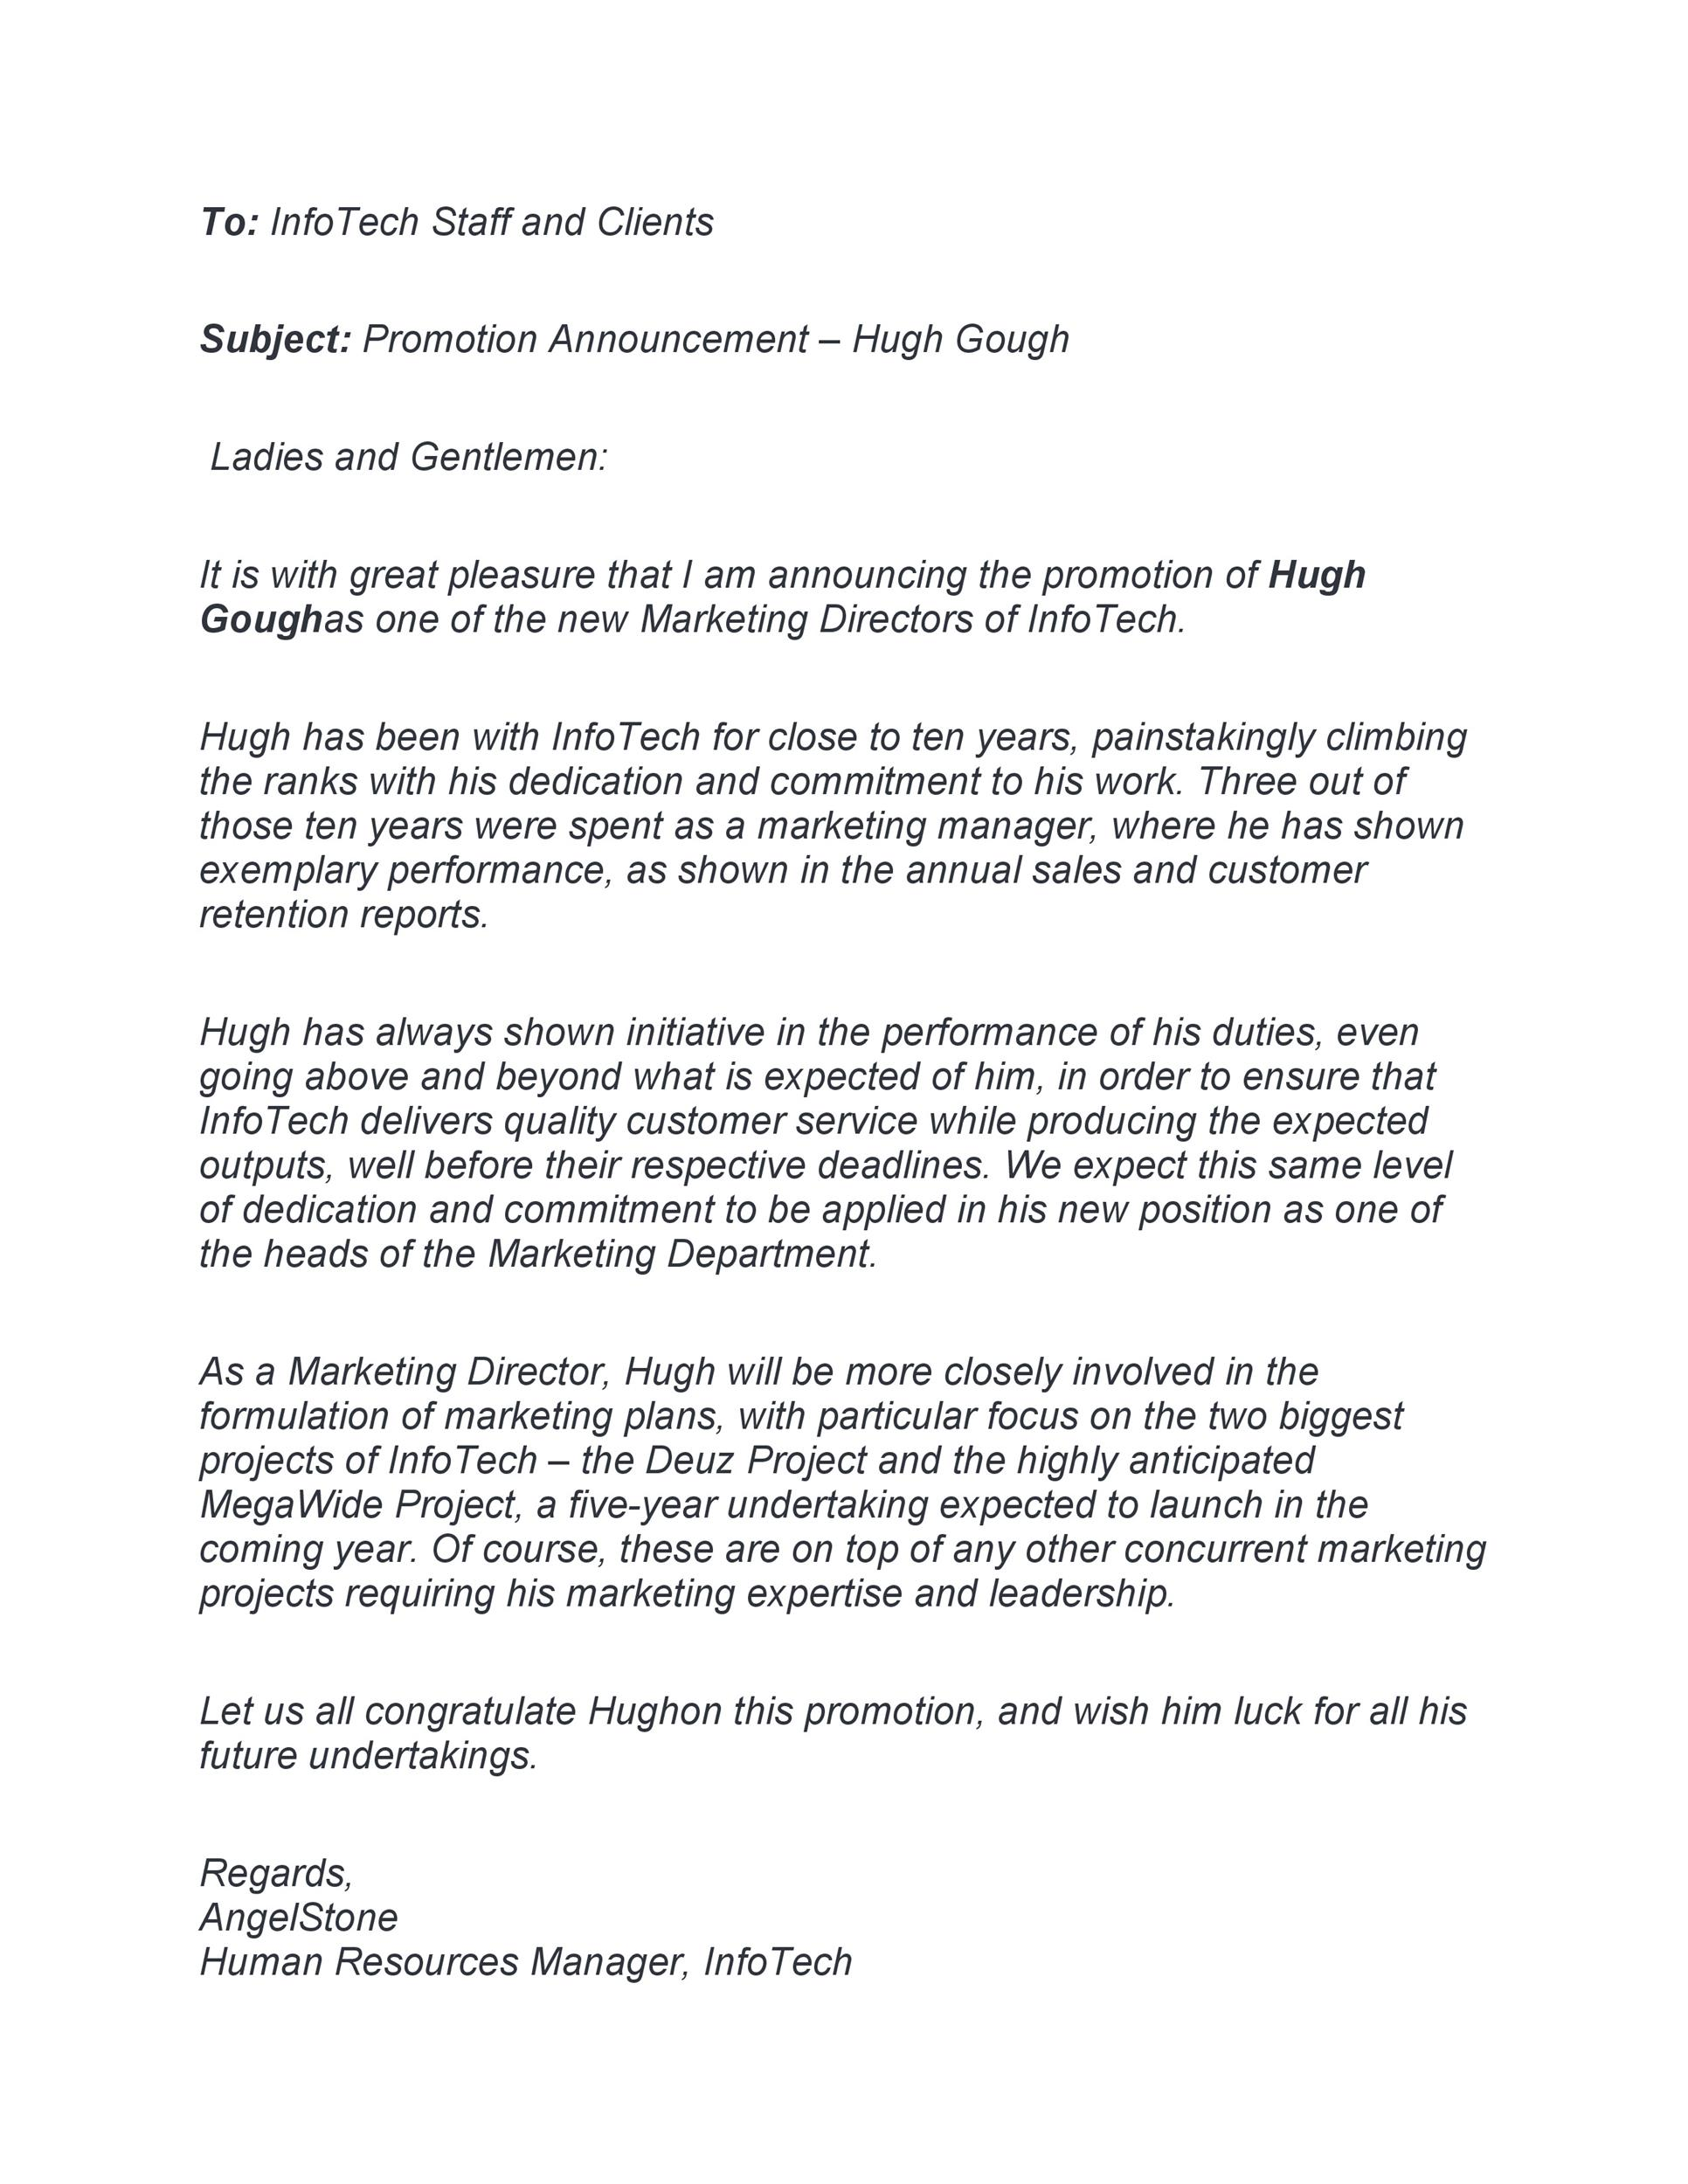 Free promotion letter 47